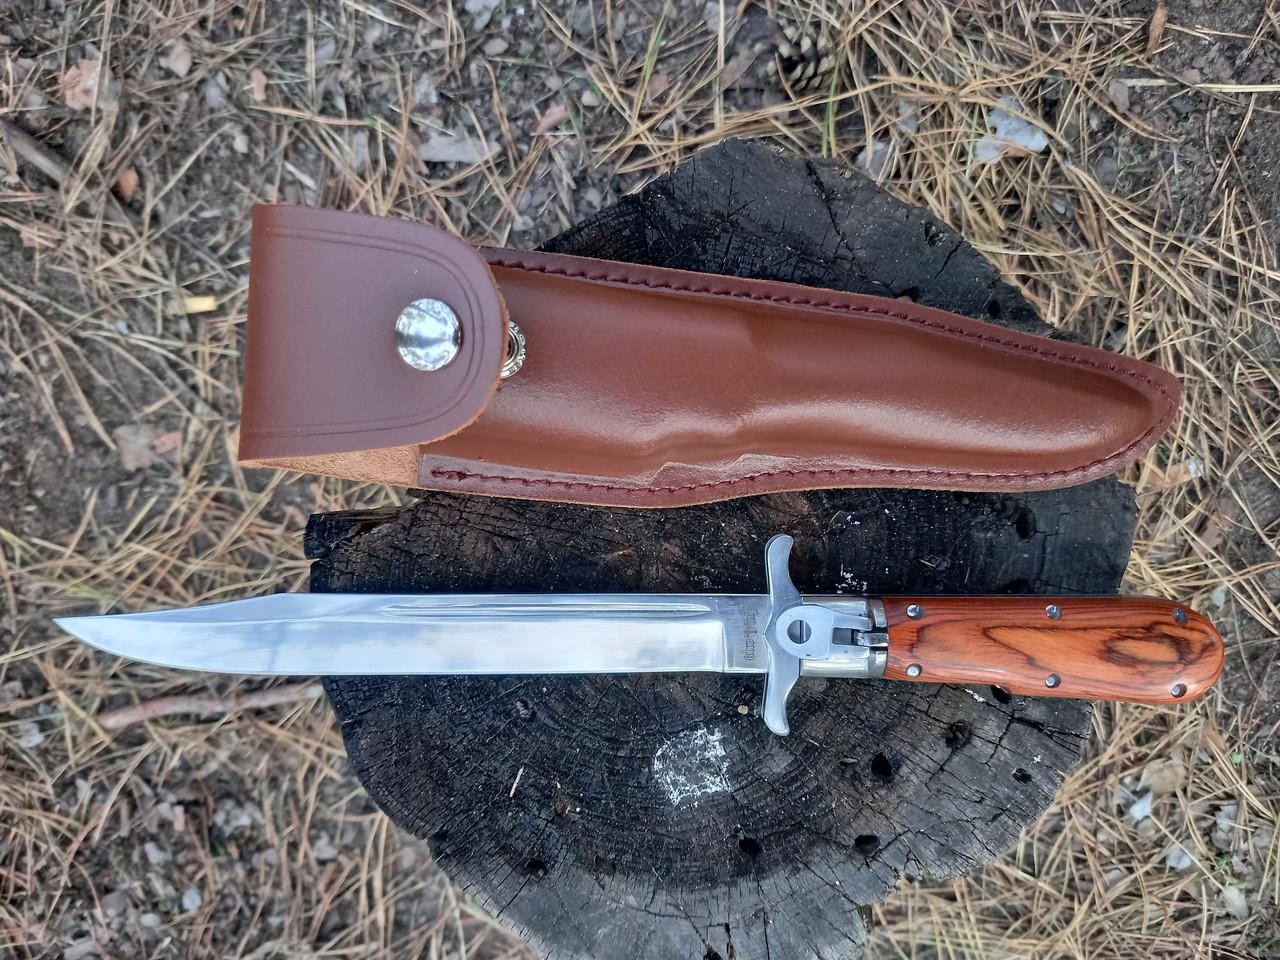 Штык нож австрийский складной xr-12 C